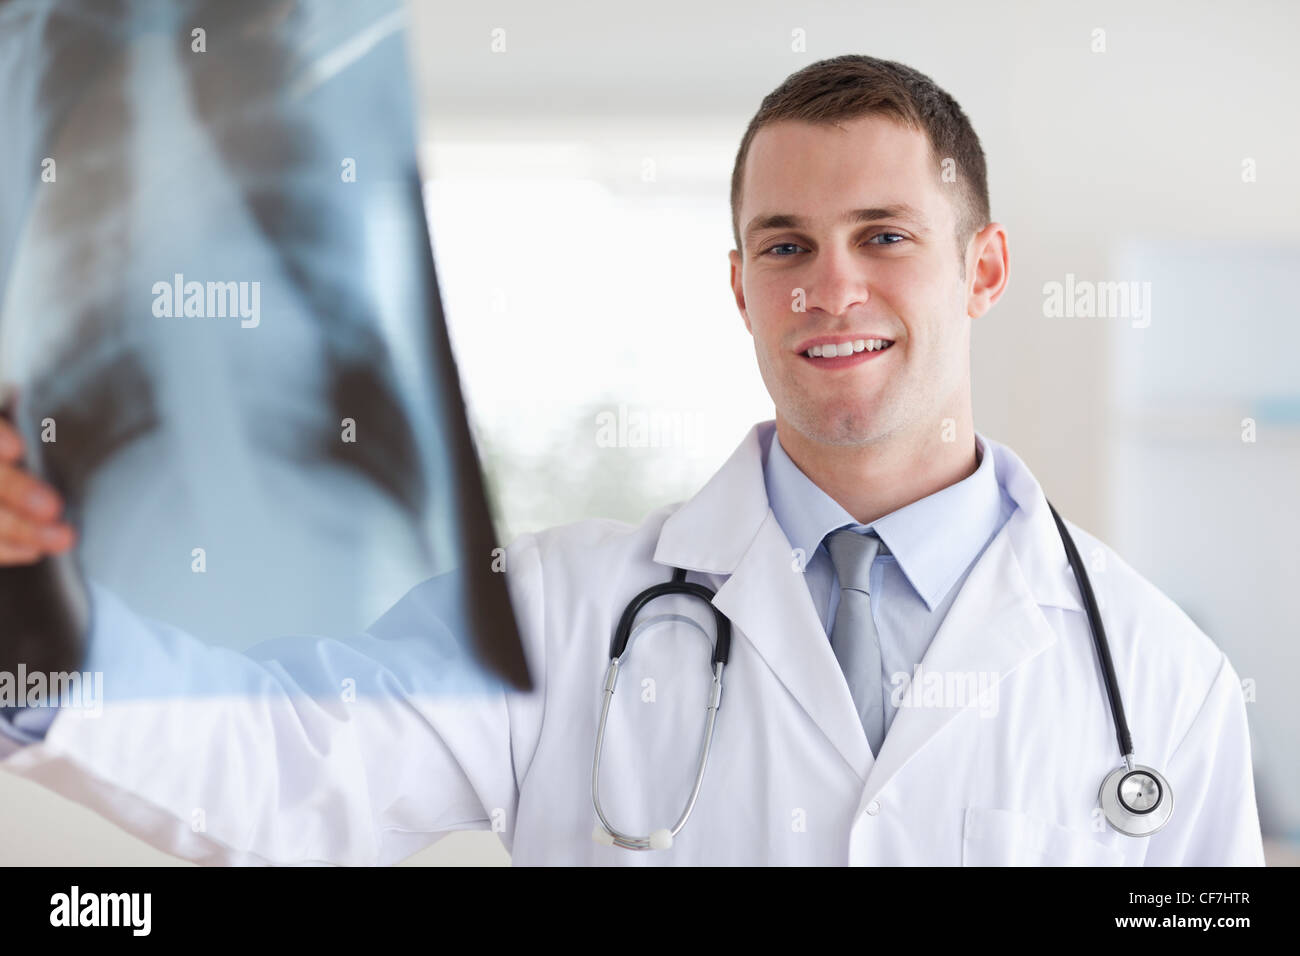 Sonriente joven doctor mirando x-ray Imagen De Stock